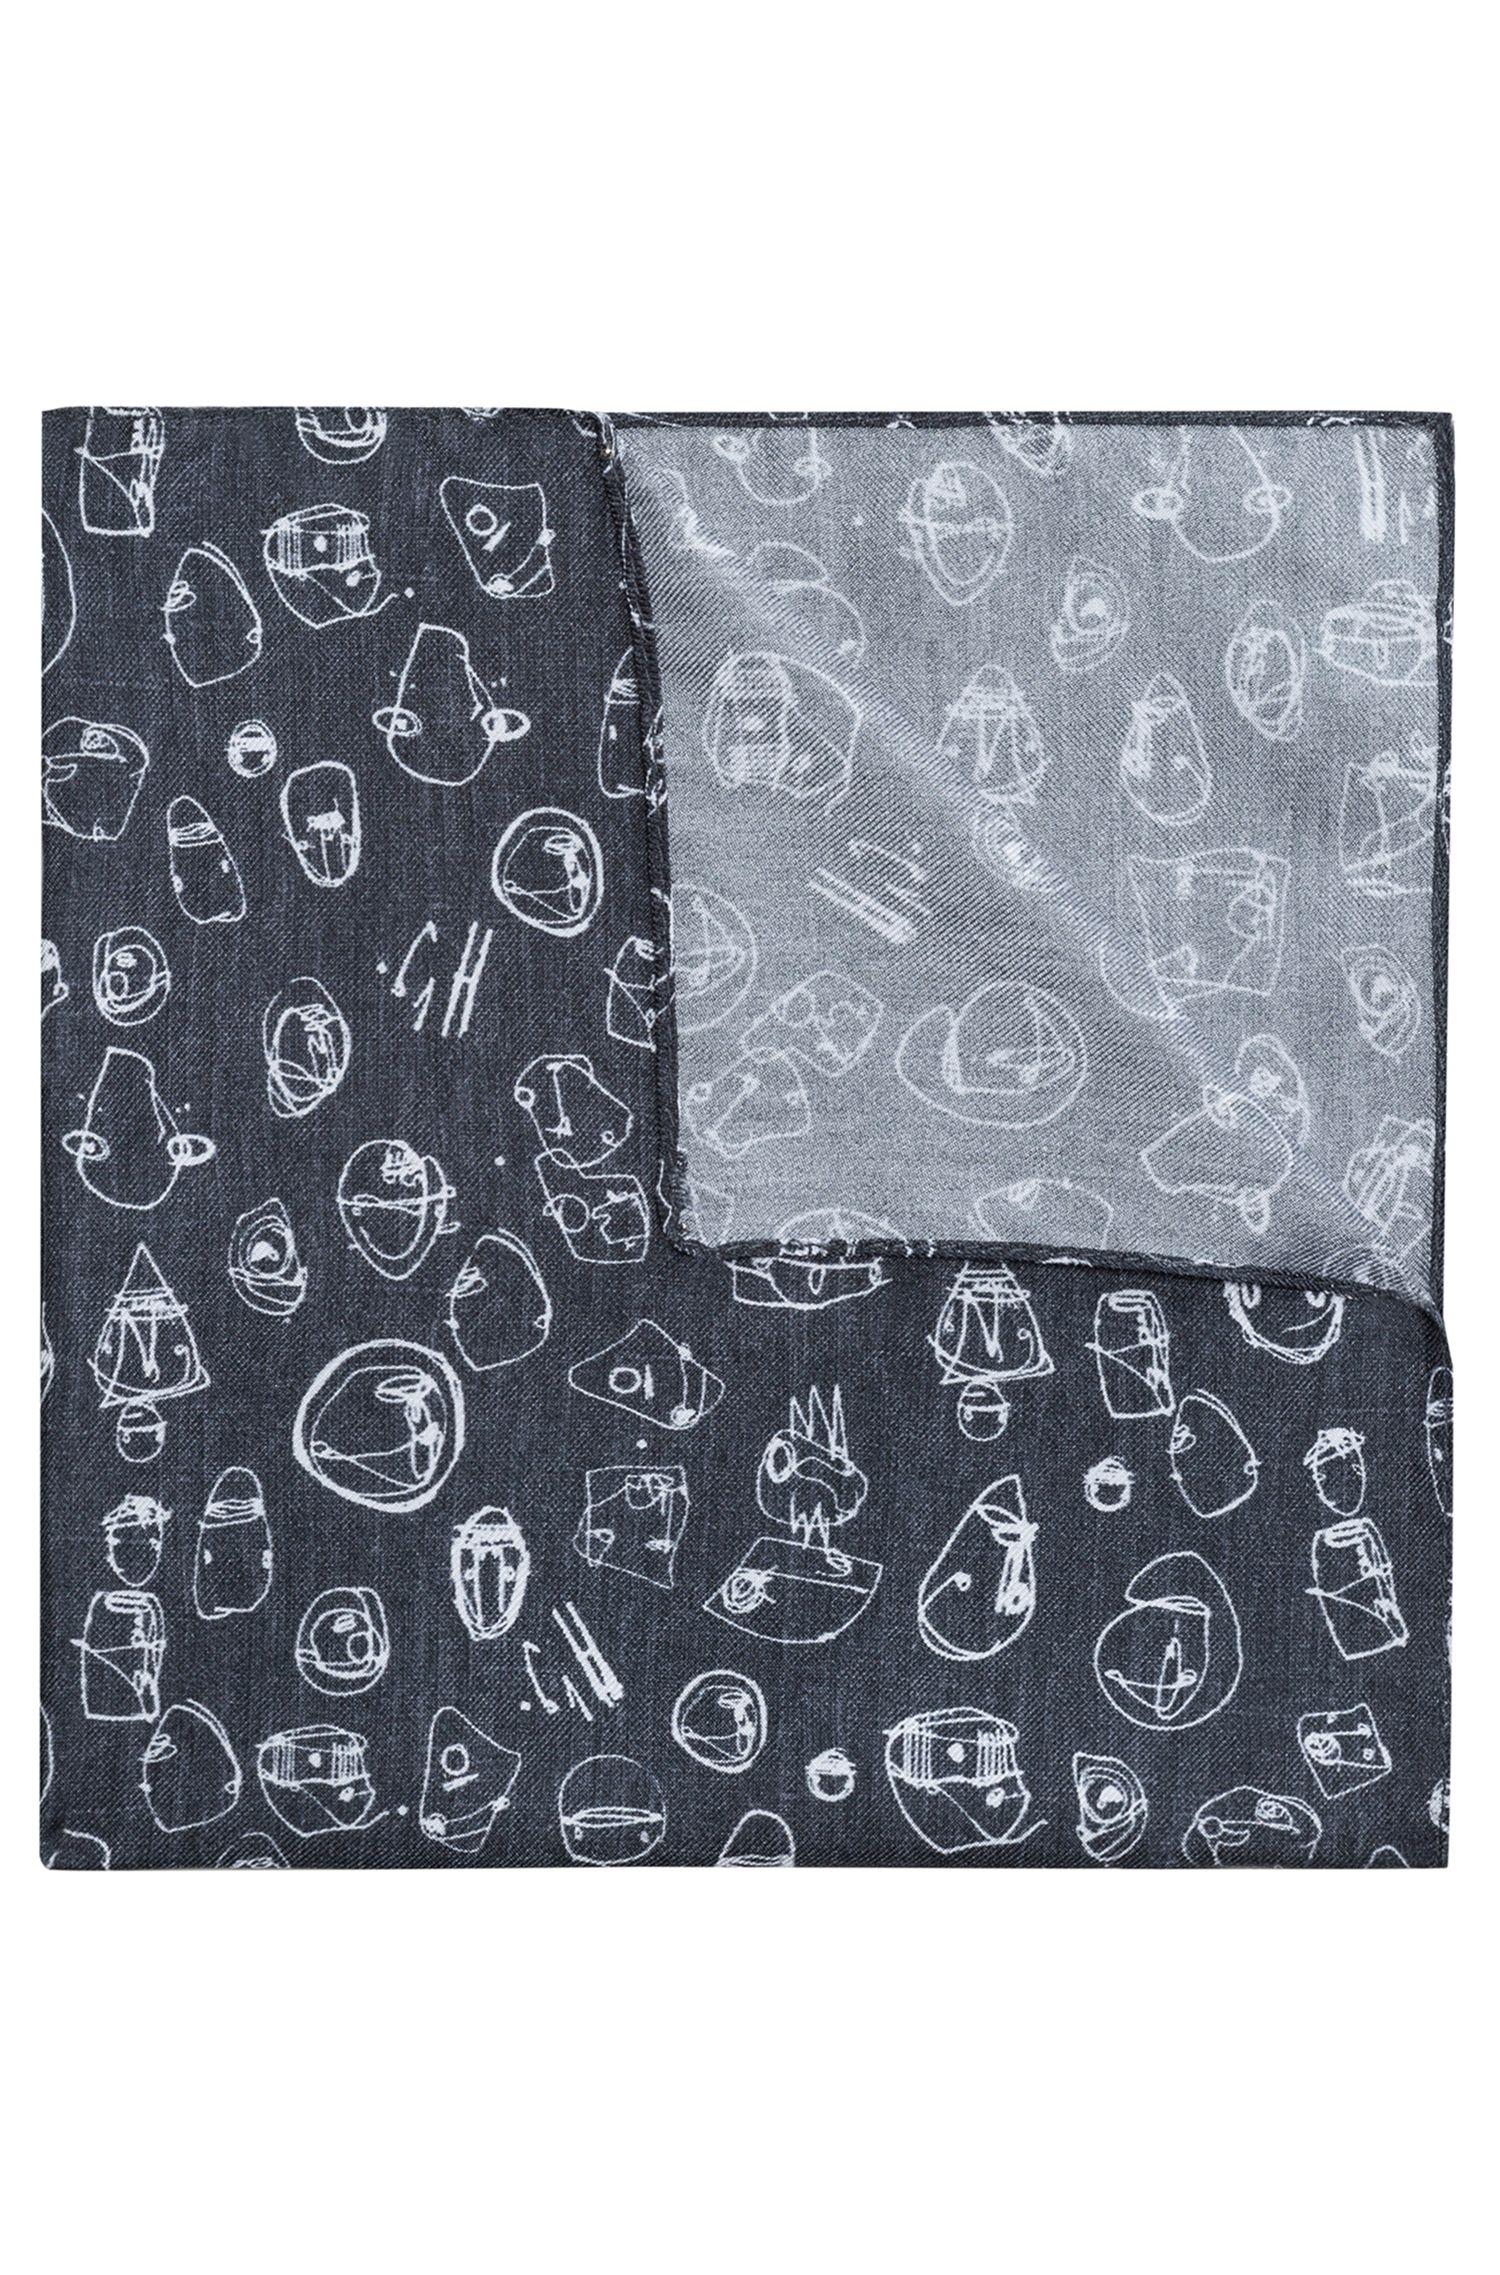 Pañuelo de bolsillo en sarga de seda con estampado de grafiti